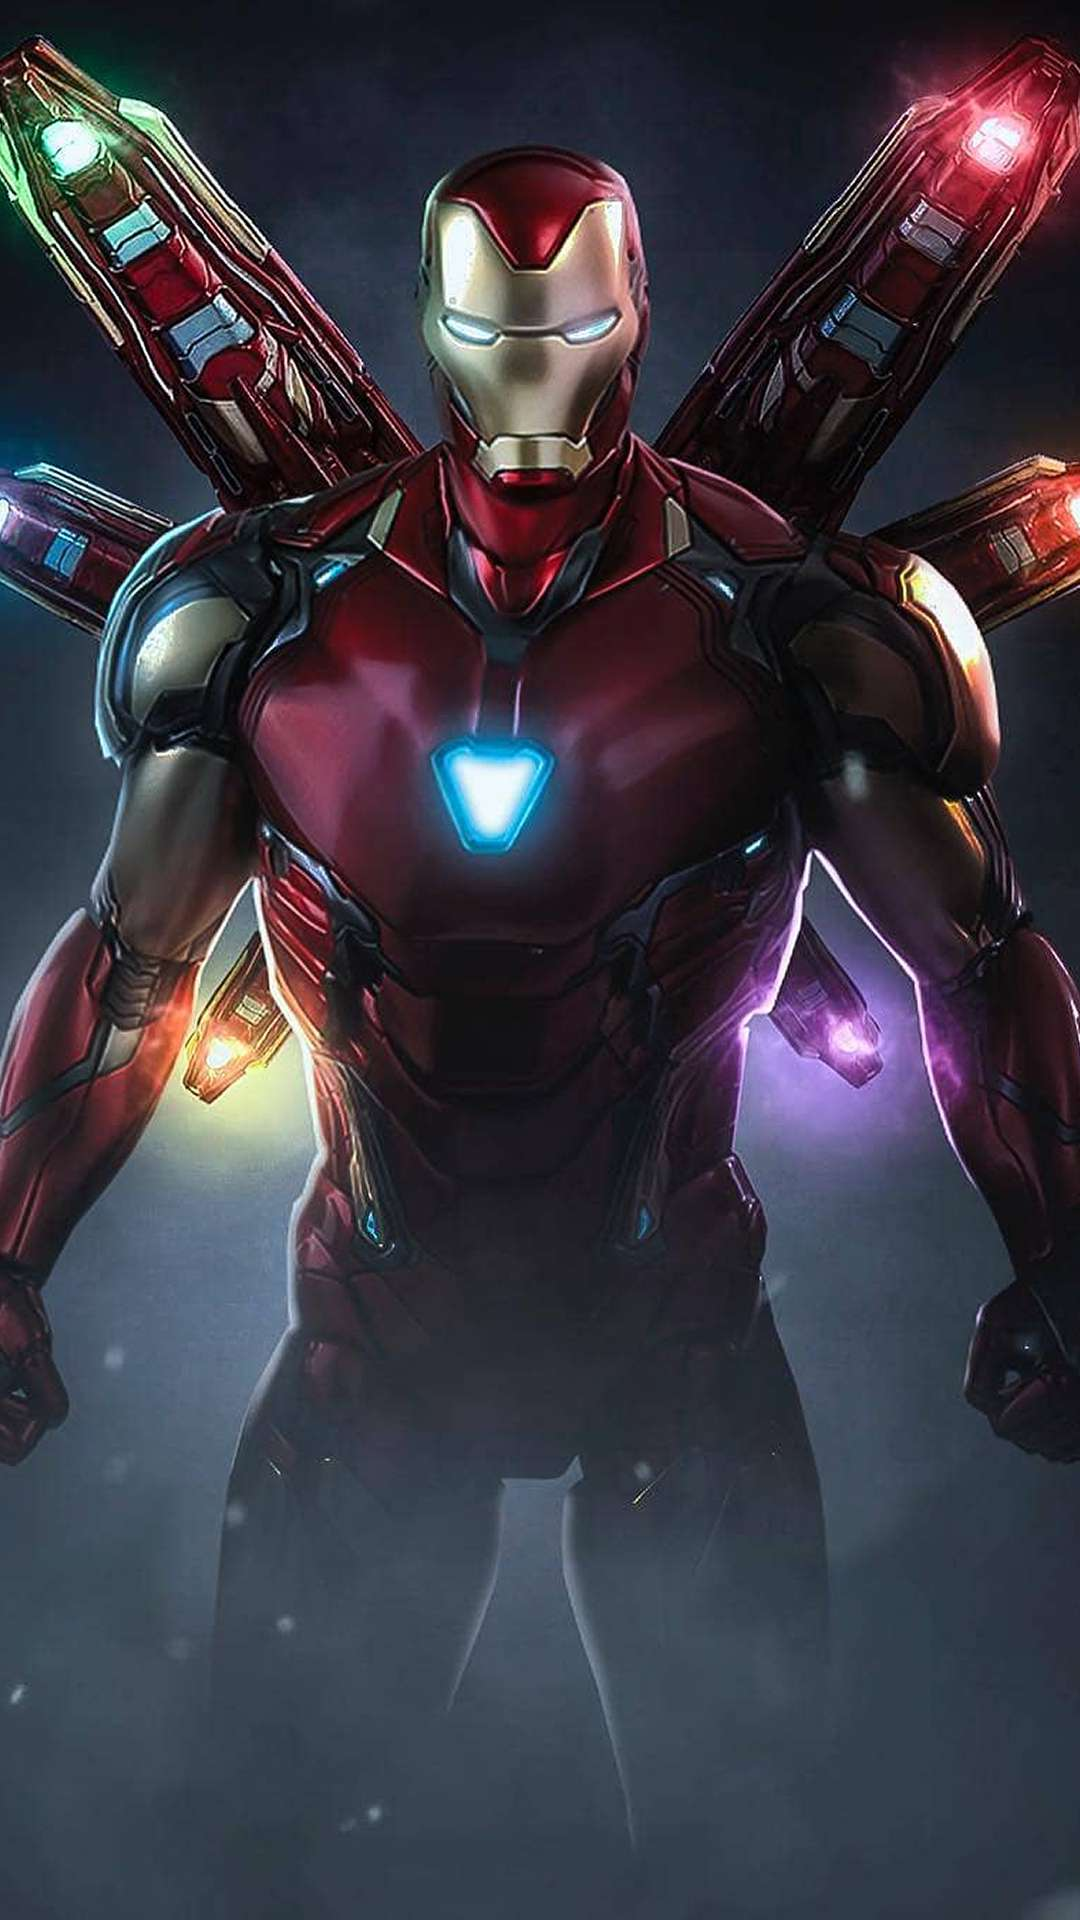 Iron Man Mark 85 Infinity Stone Armor iPhone Wallpaper